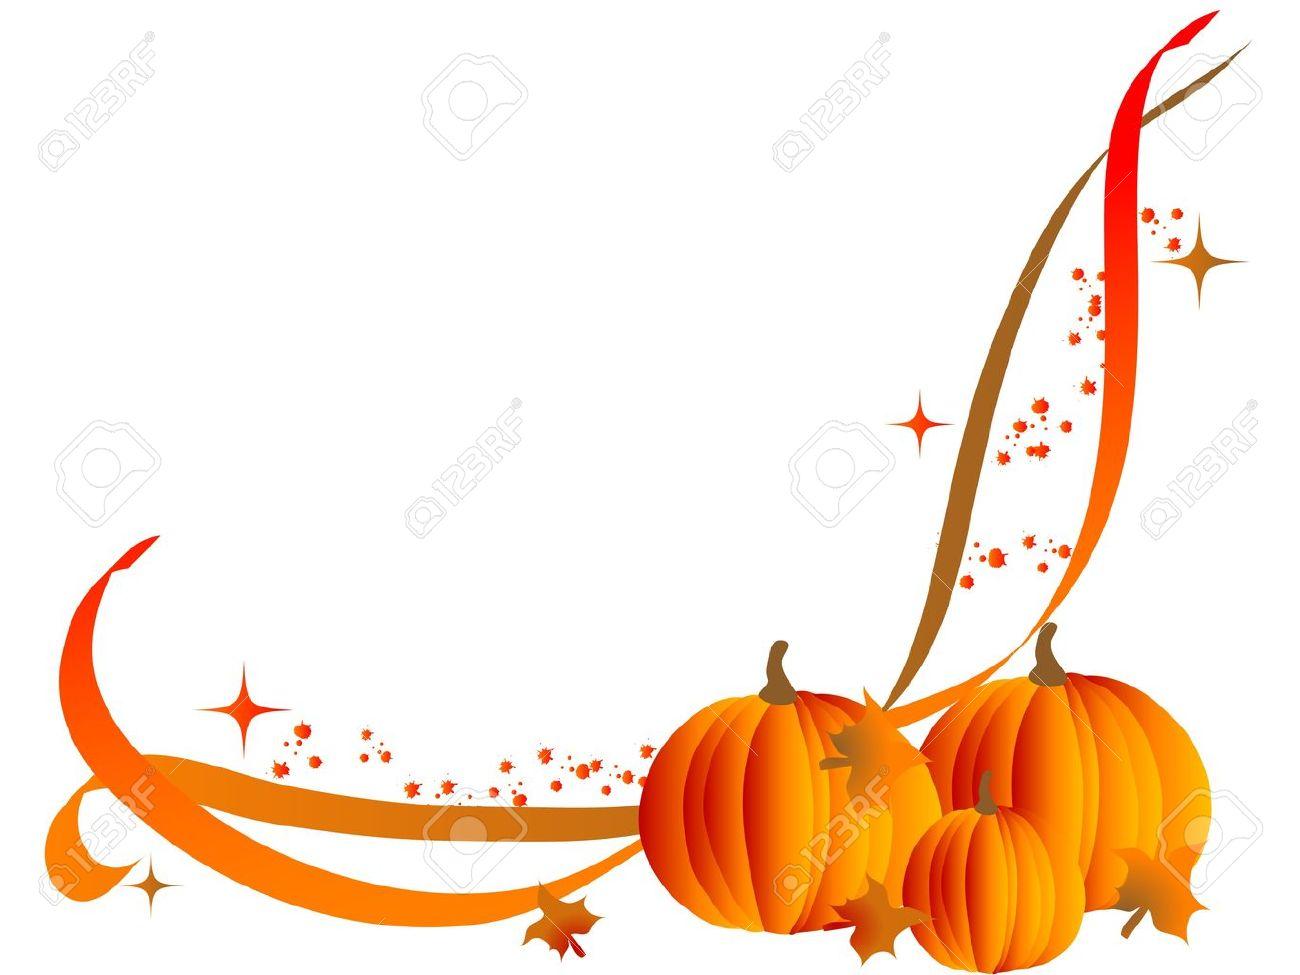 4 027 pumpkin border stock illustrations cliparts and royalty free rh 123rf com